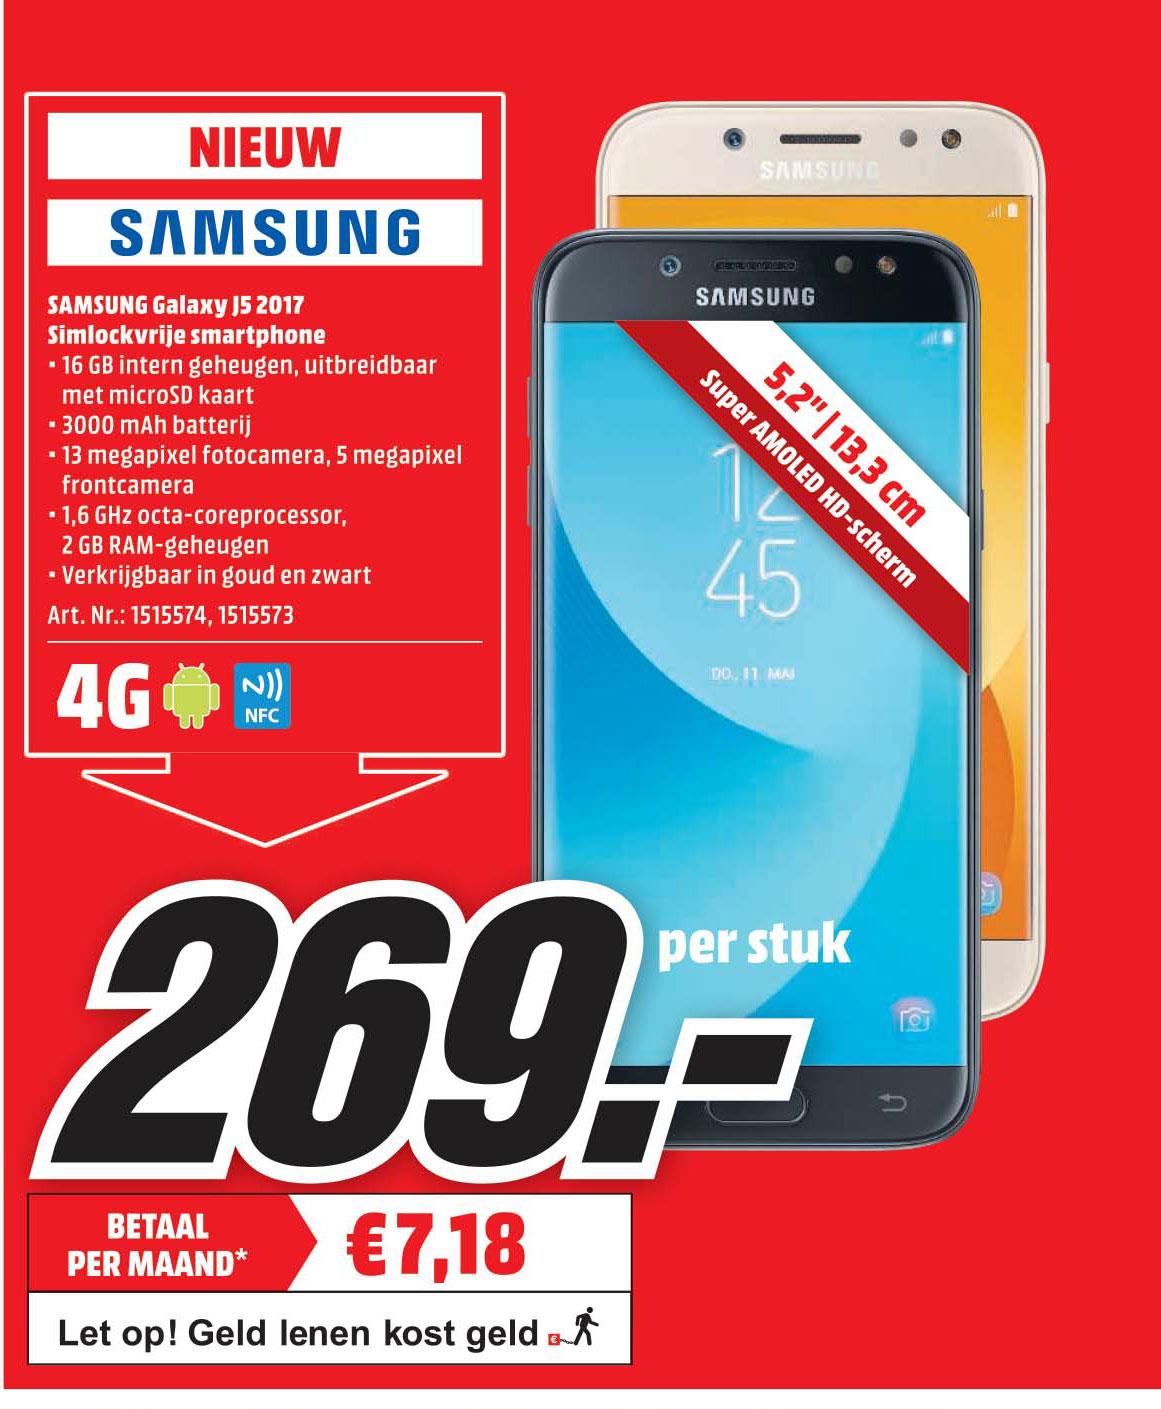 Samsung Galaxy J5 2017 Simlockvrije Smartphone Aanbieding Bij Mediamarkt